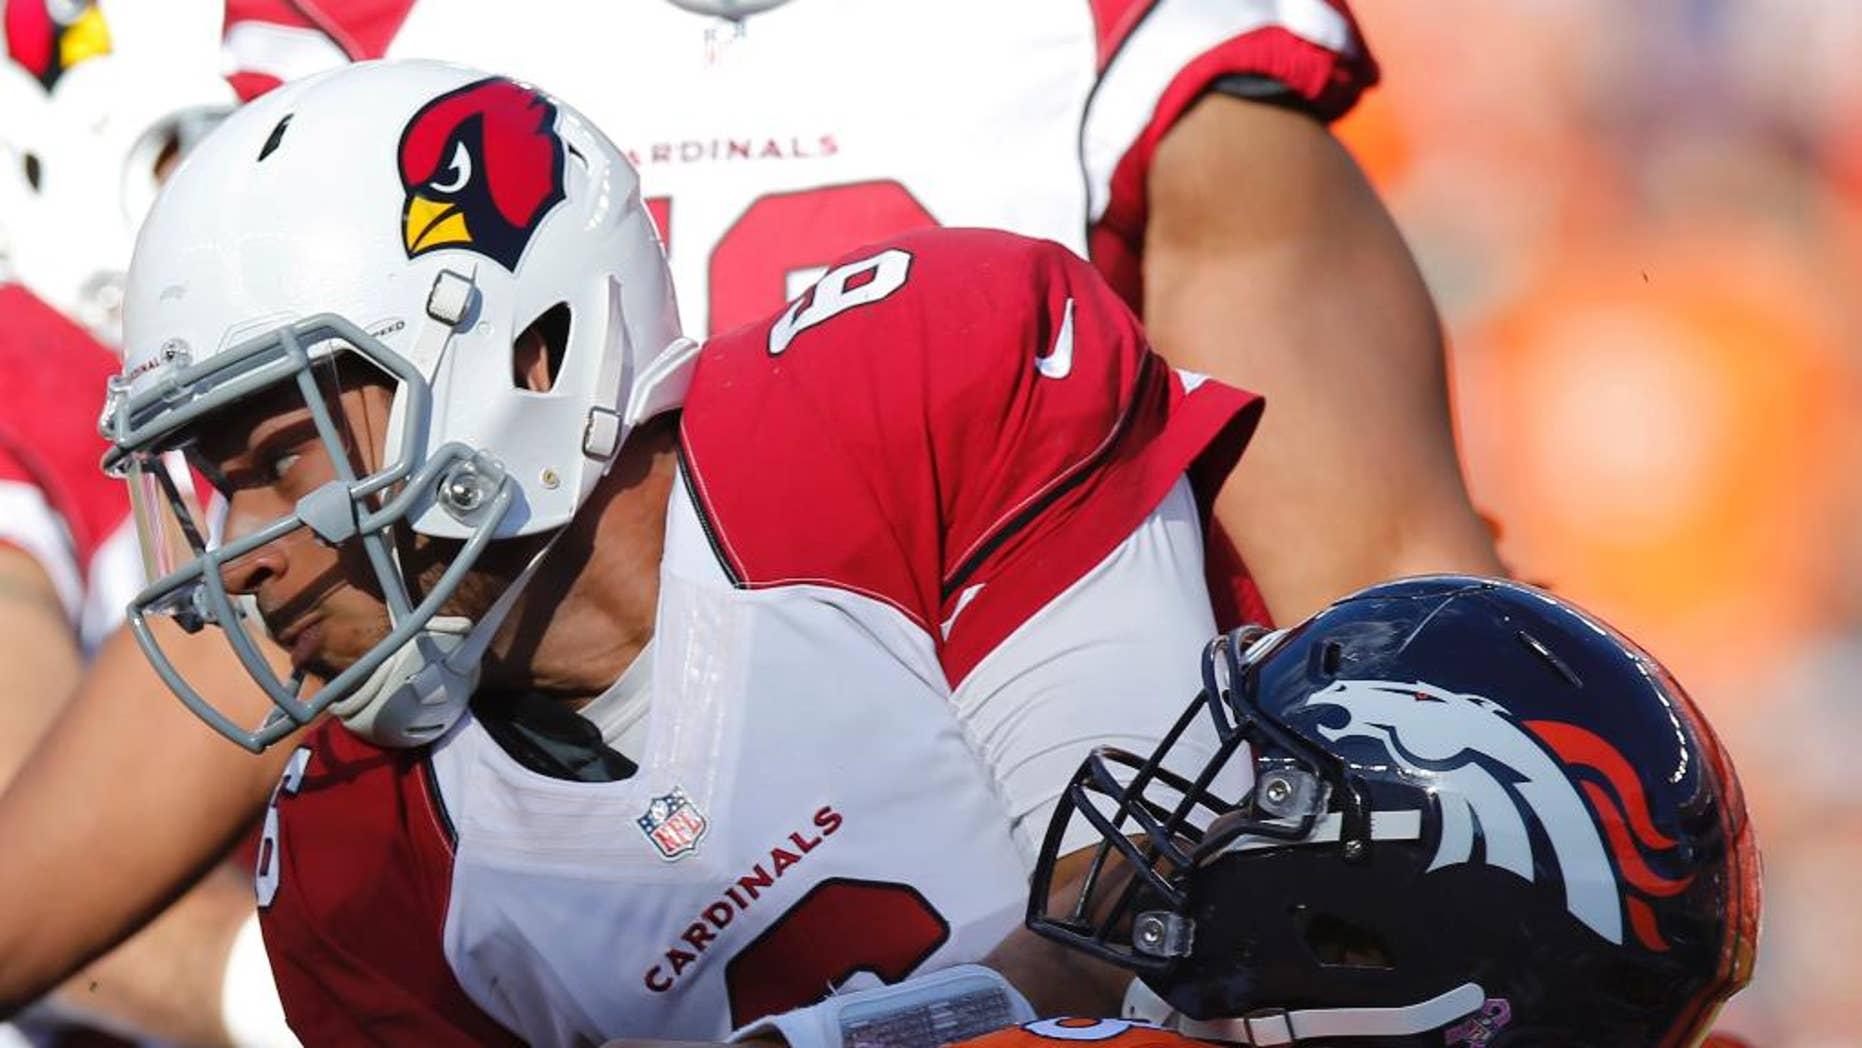 Arizona Cardinals quarterback Logan Thomas is sacked by Denver Broncos outside linebacker Von Miller (58) during the second half of an NFL football game, Sunday, Oct. 5, 2014, in Denver. (AP Photo/David Zalubowski)